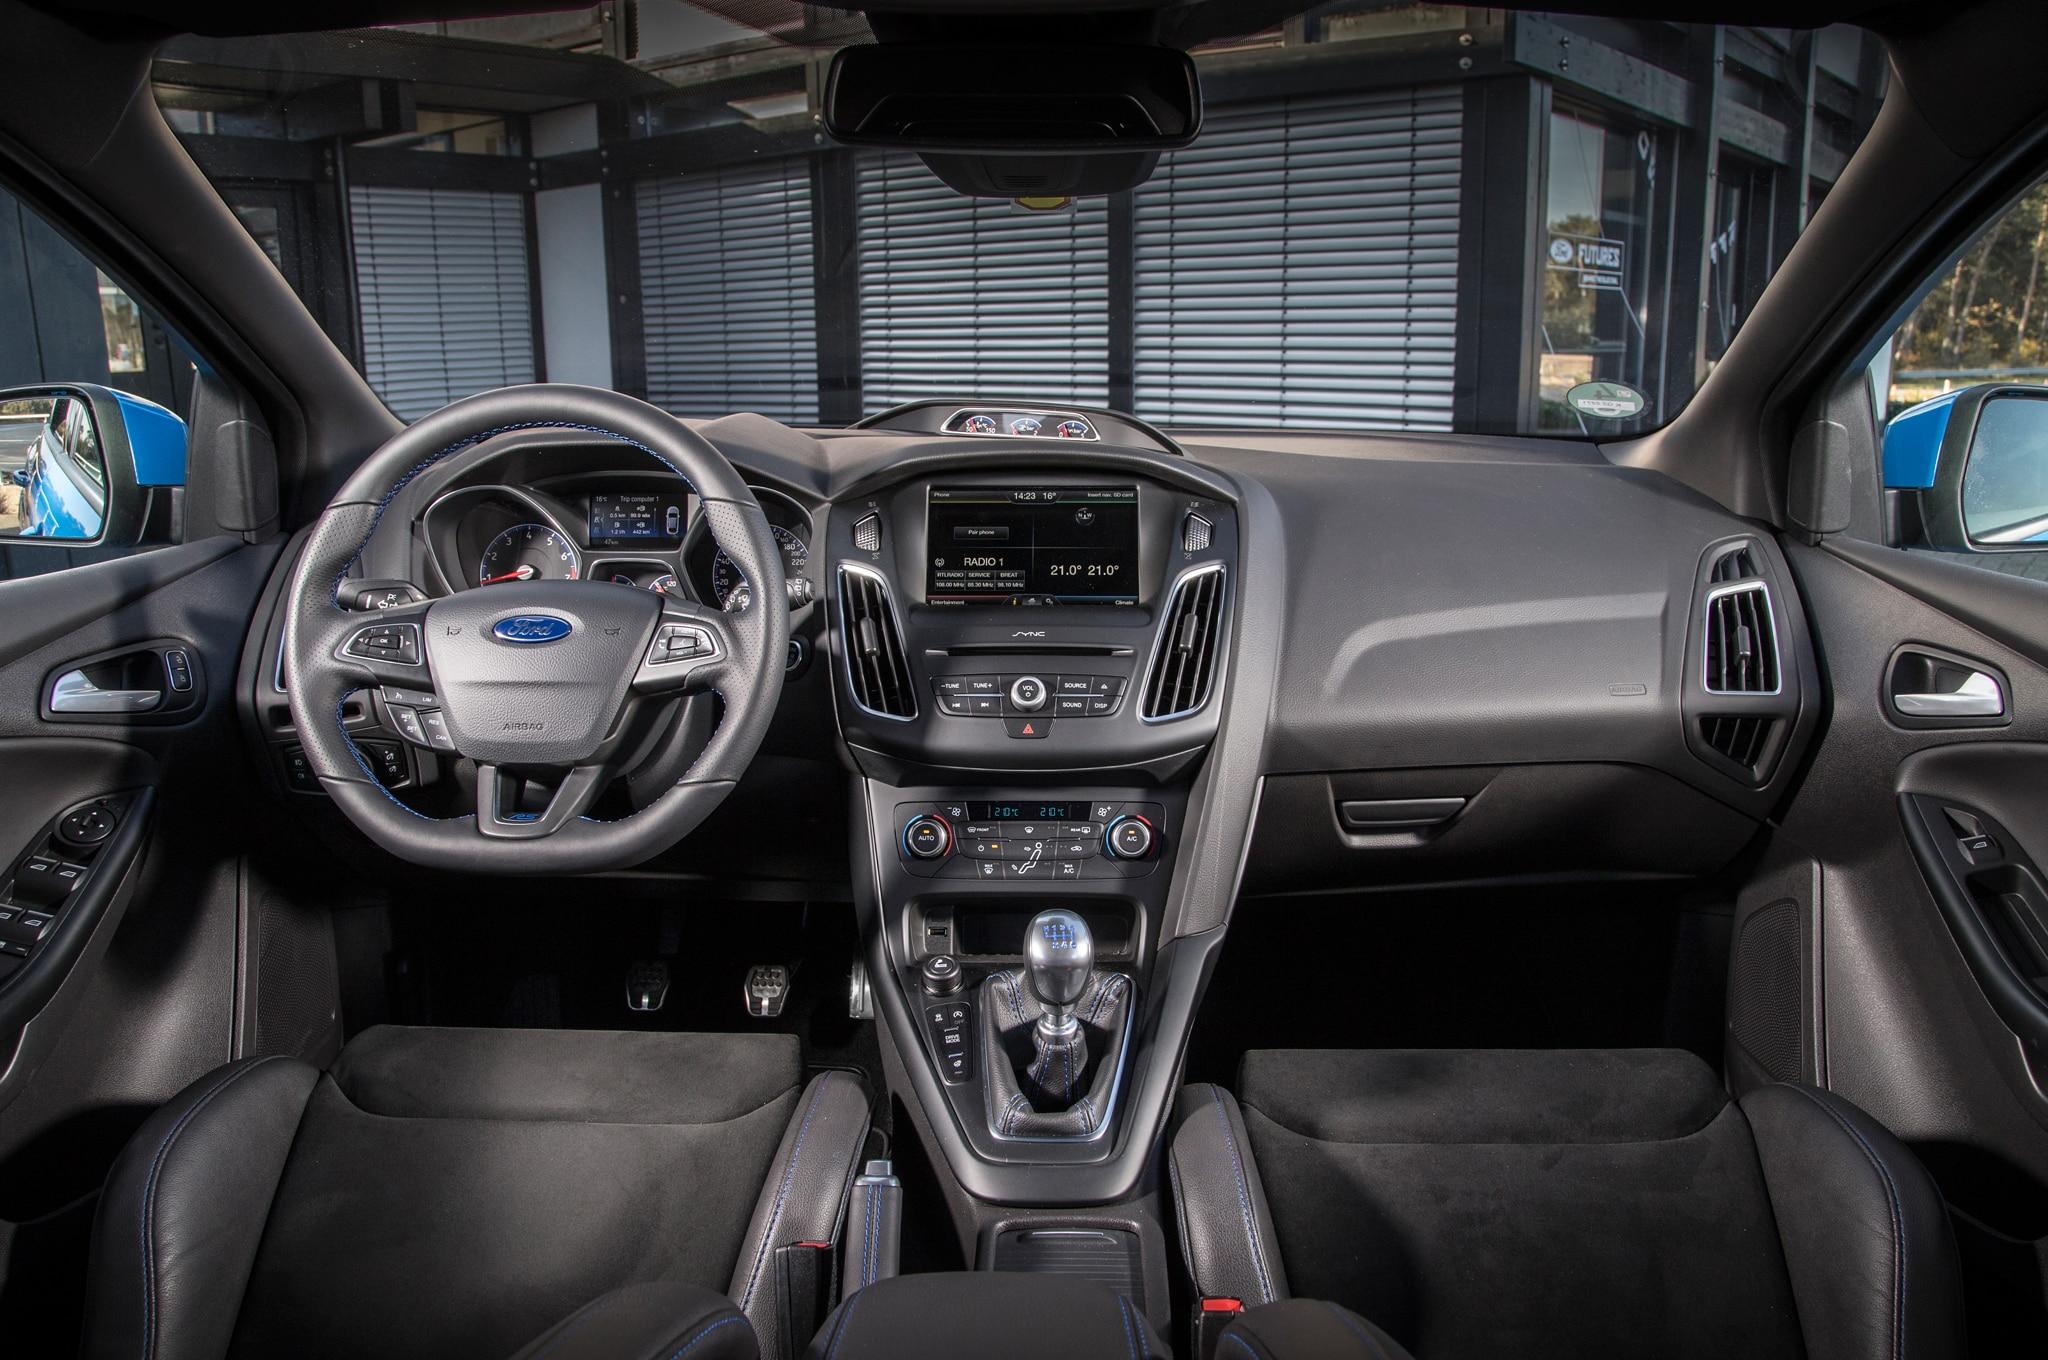 2016 Ford Focus Rs Interior Motor Trend En Espa 241 Ol